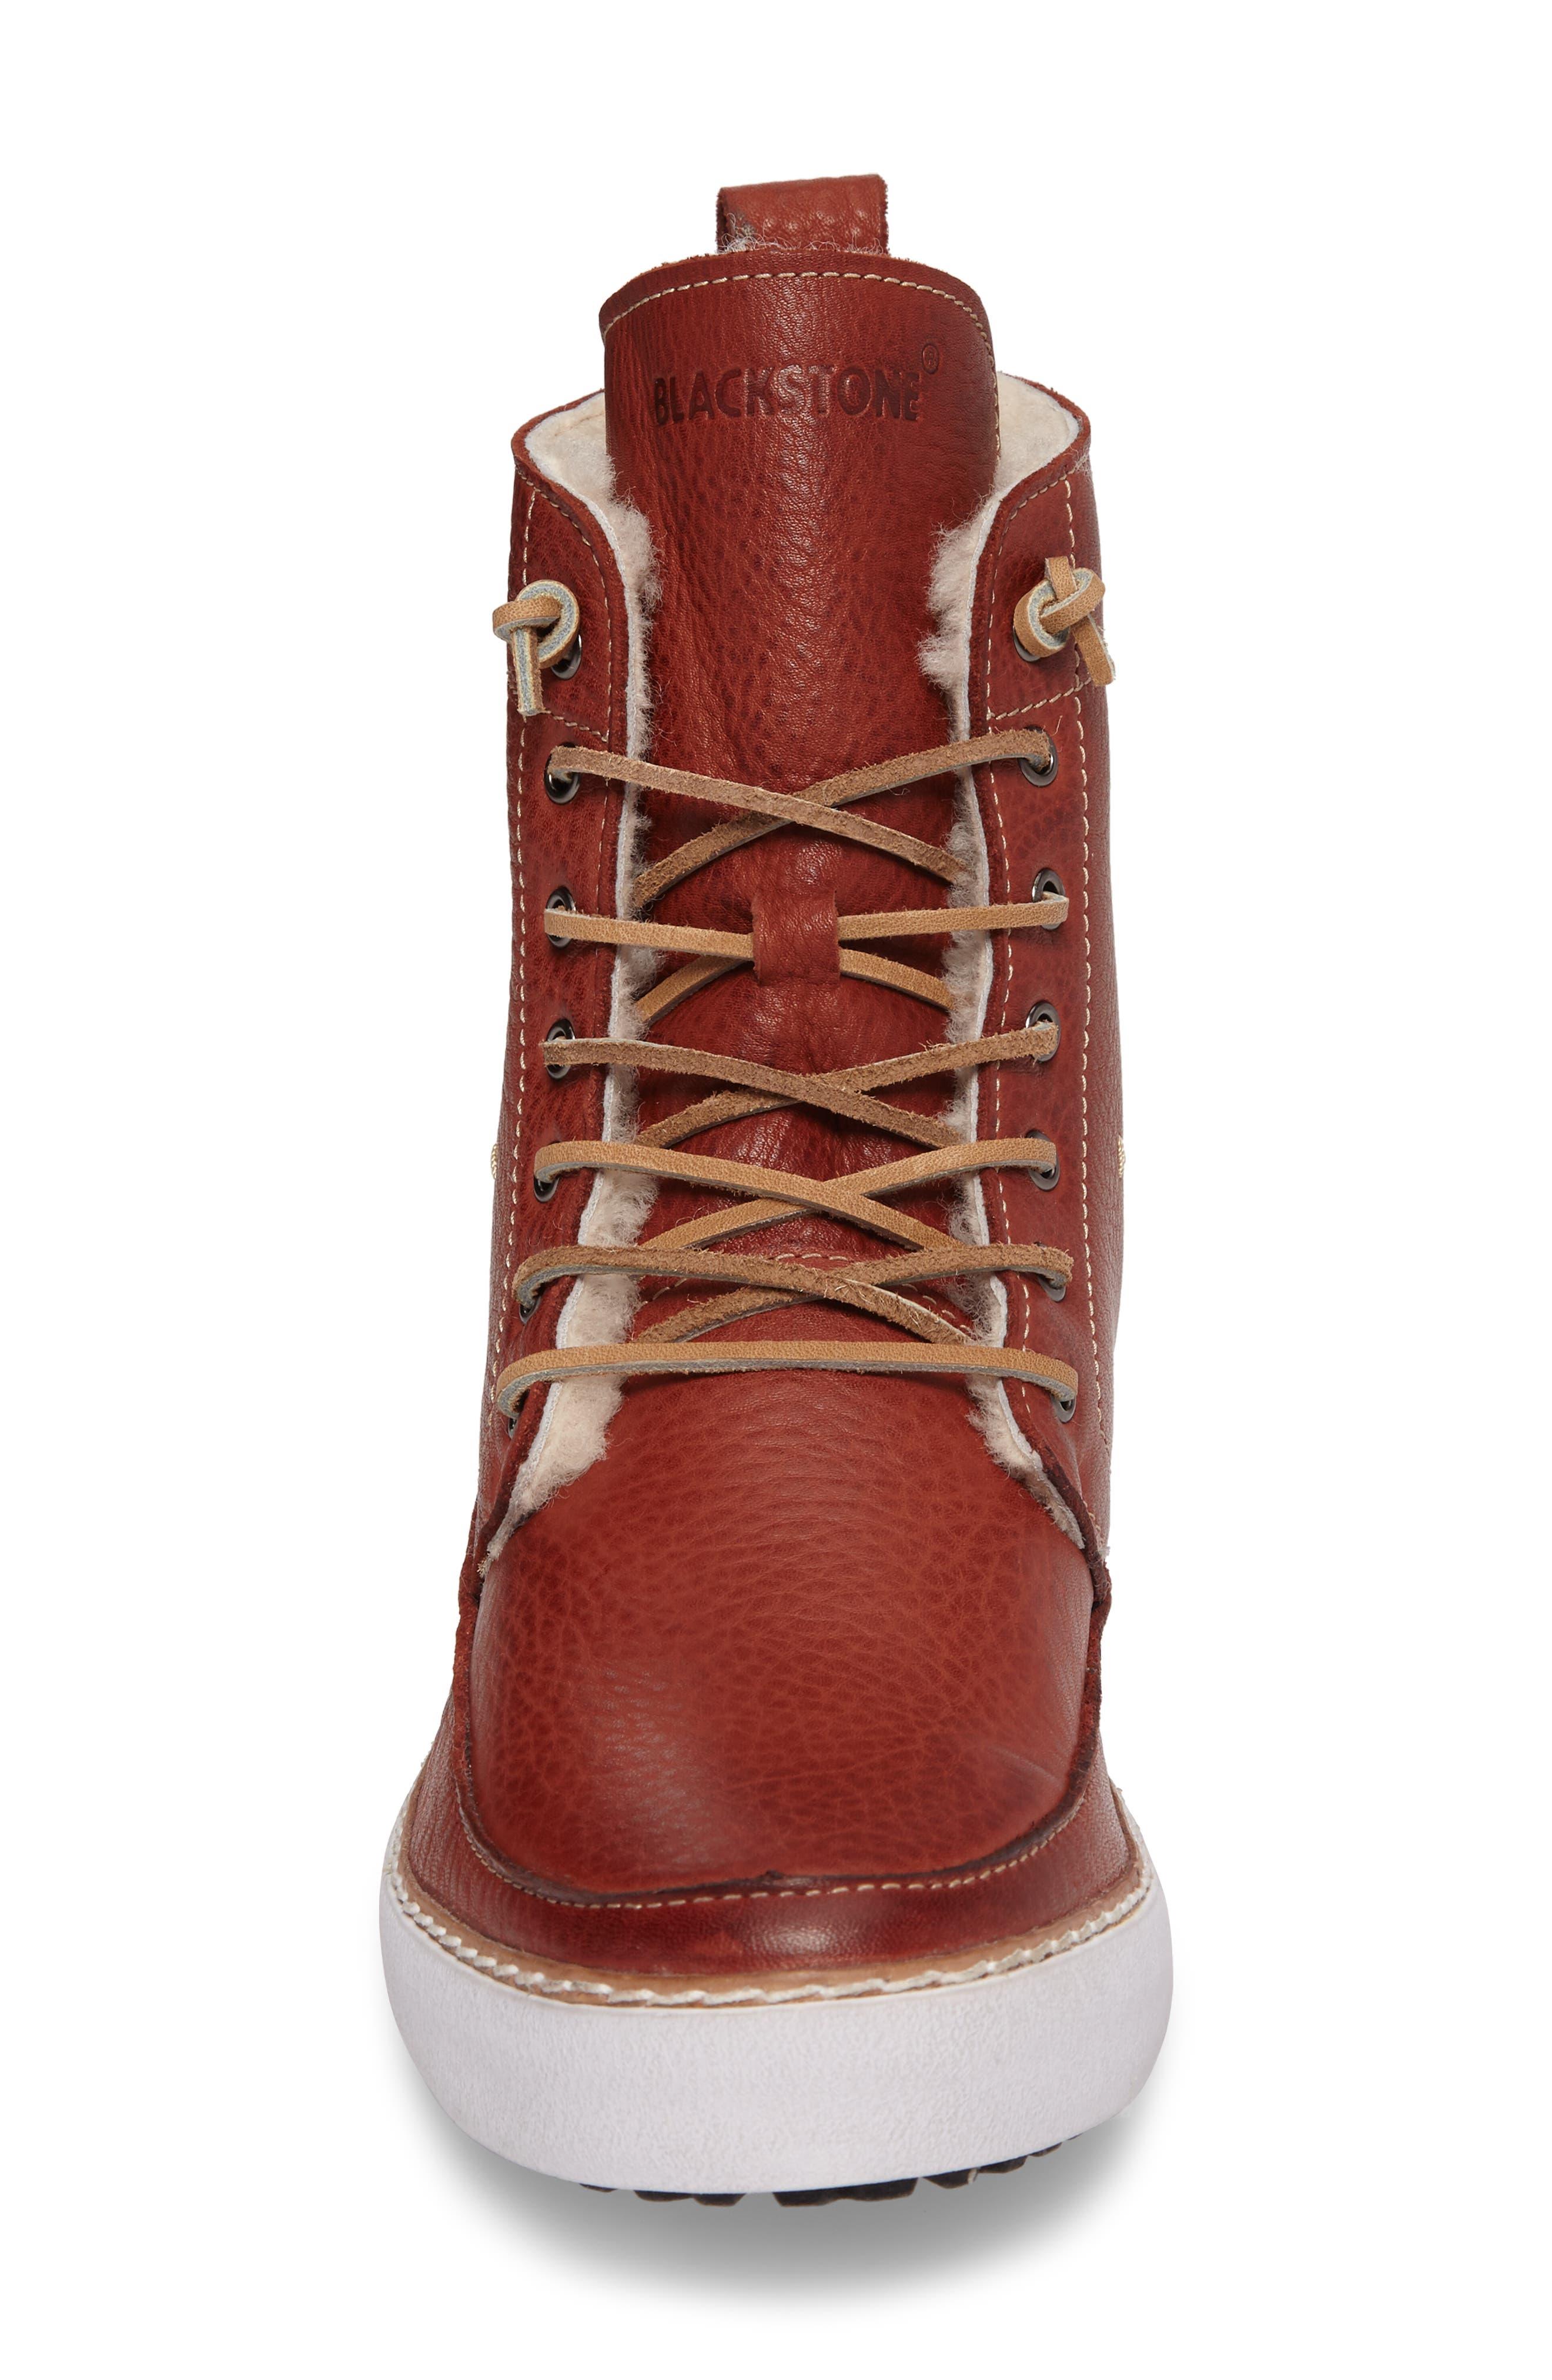 BLACKSTONE,                             'AM 32' Shearling Lined Boot,                             Alternate thumbnail 4, color,                             200